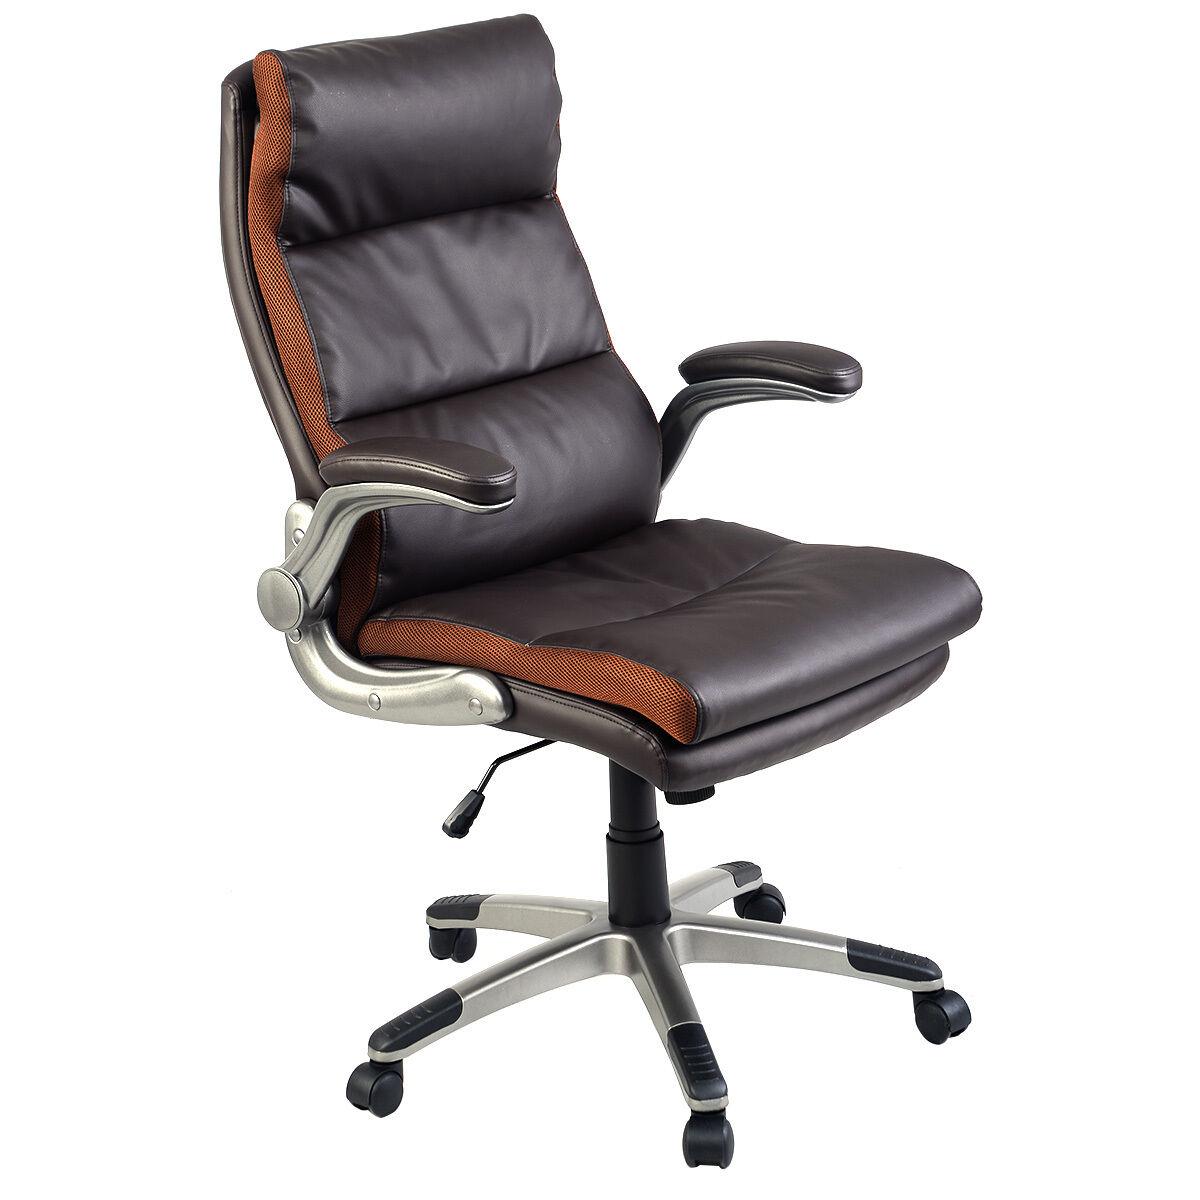 New Ergonomic PU Leather High Back Executive Computer Desk ...